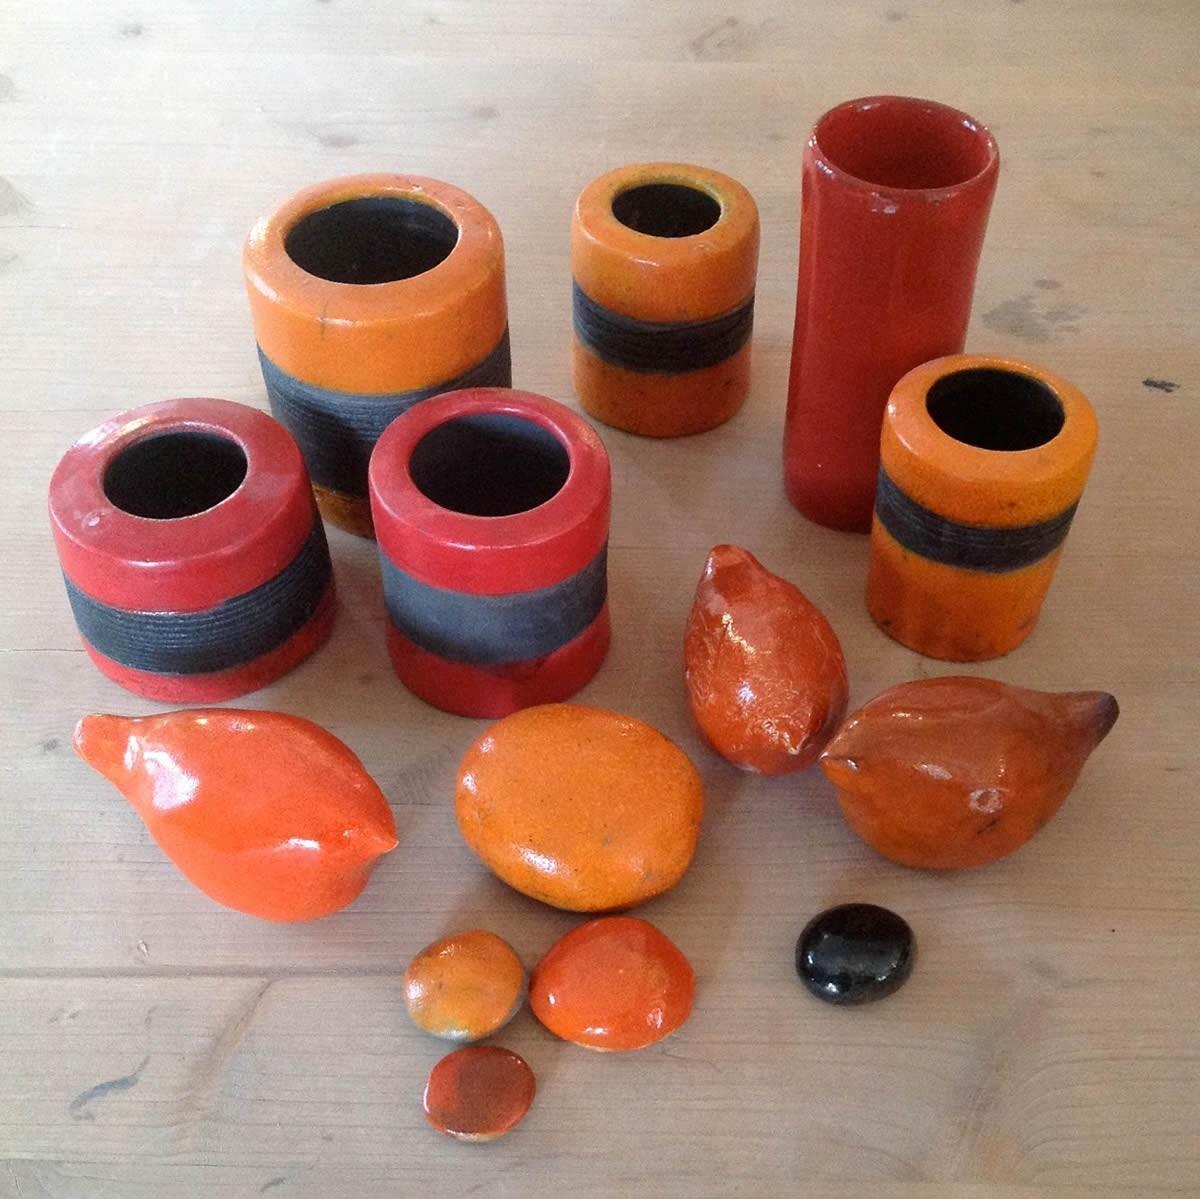 1920x1440-141959-sitraact696807-337801-atelier-du-punier-6-143239